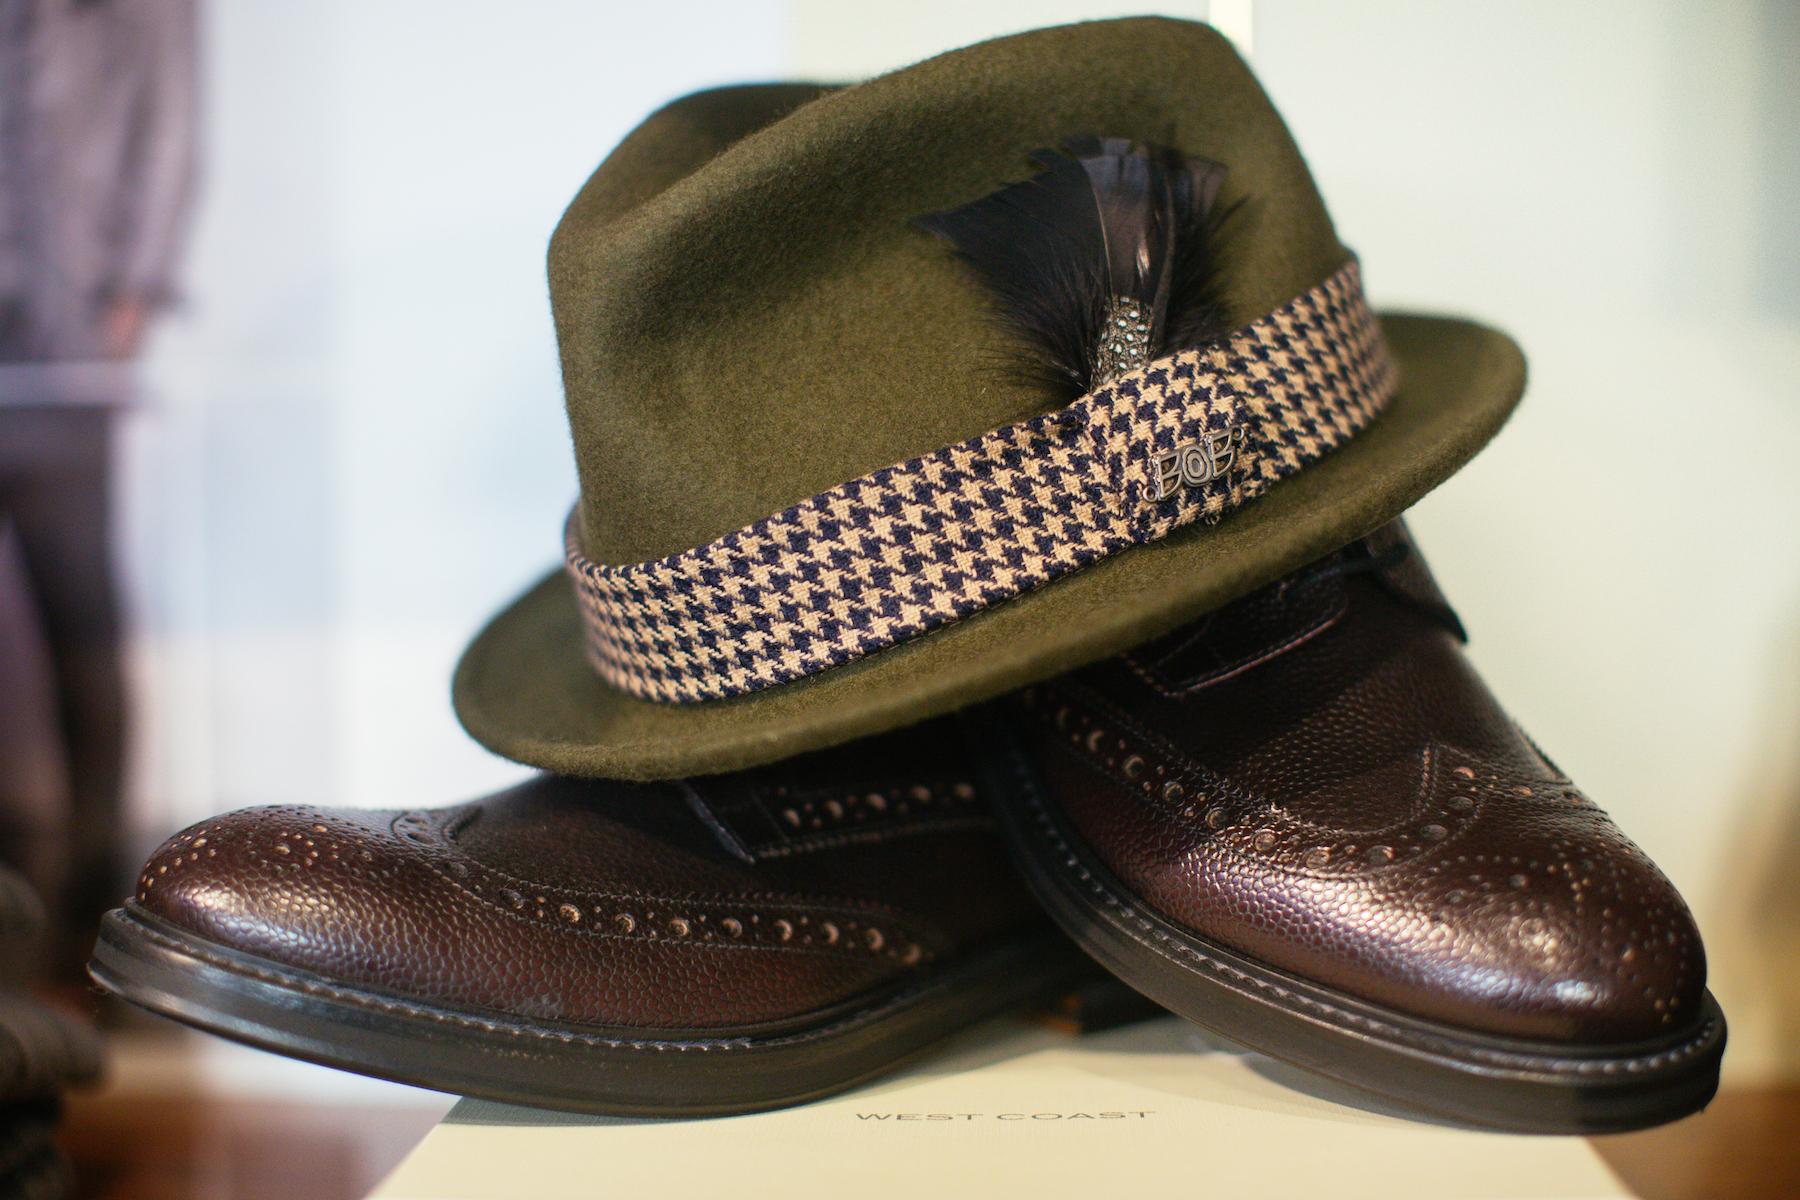 accessori-moda-uomo-scarpe-cappelli-cinture-cravatte